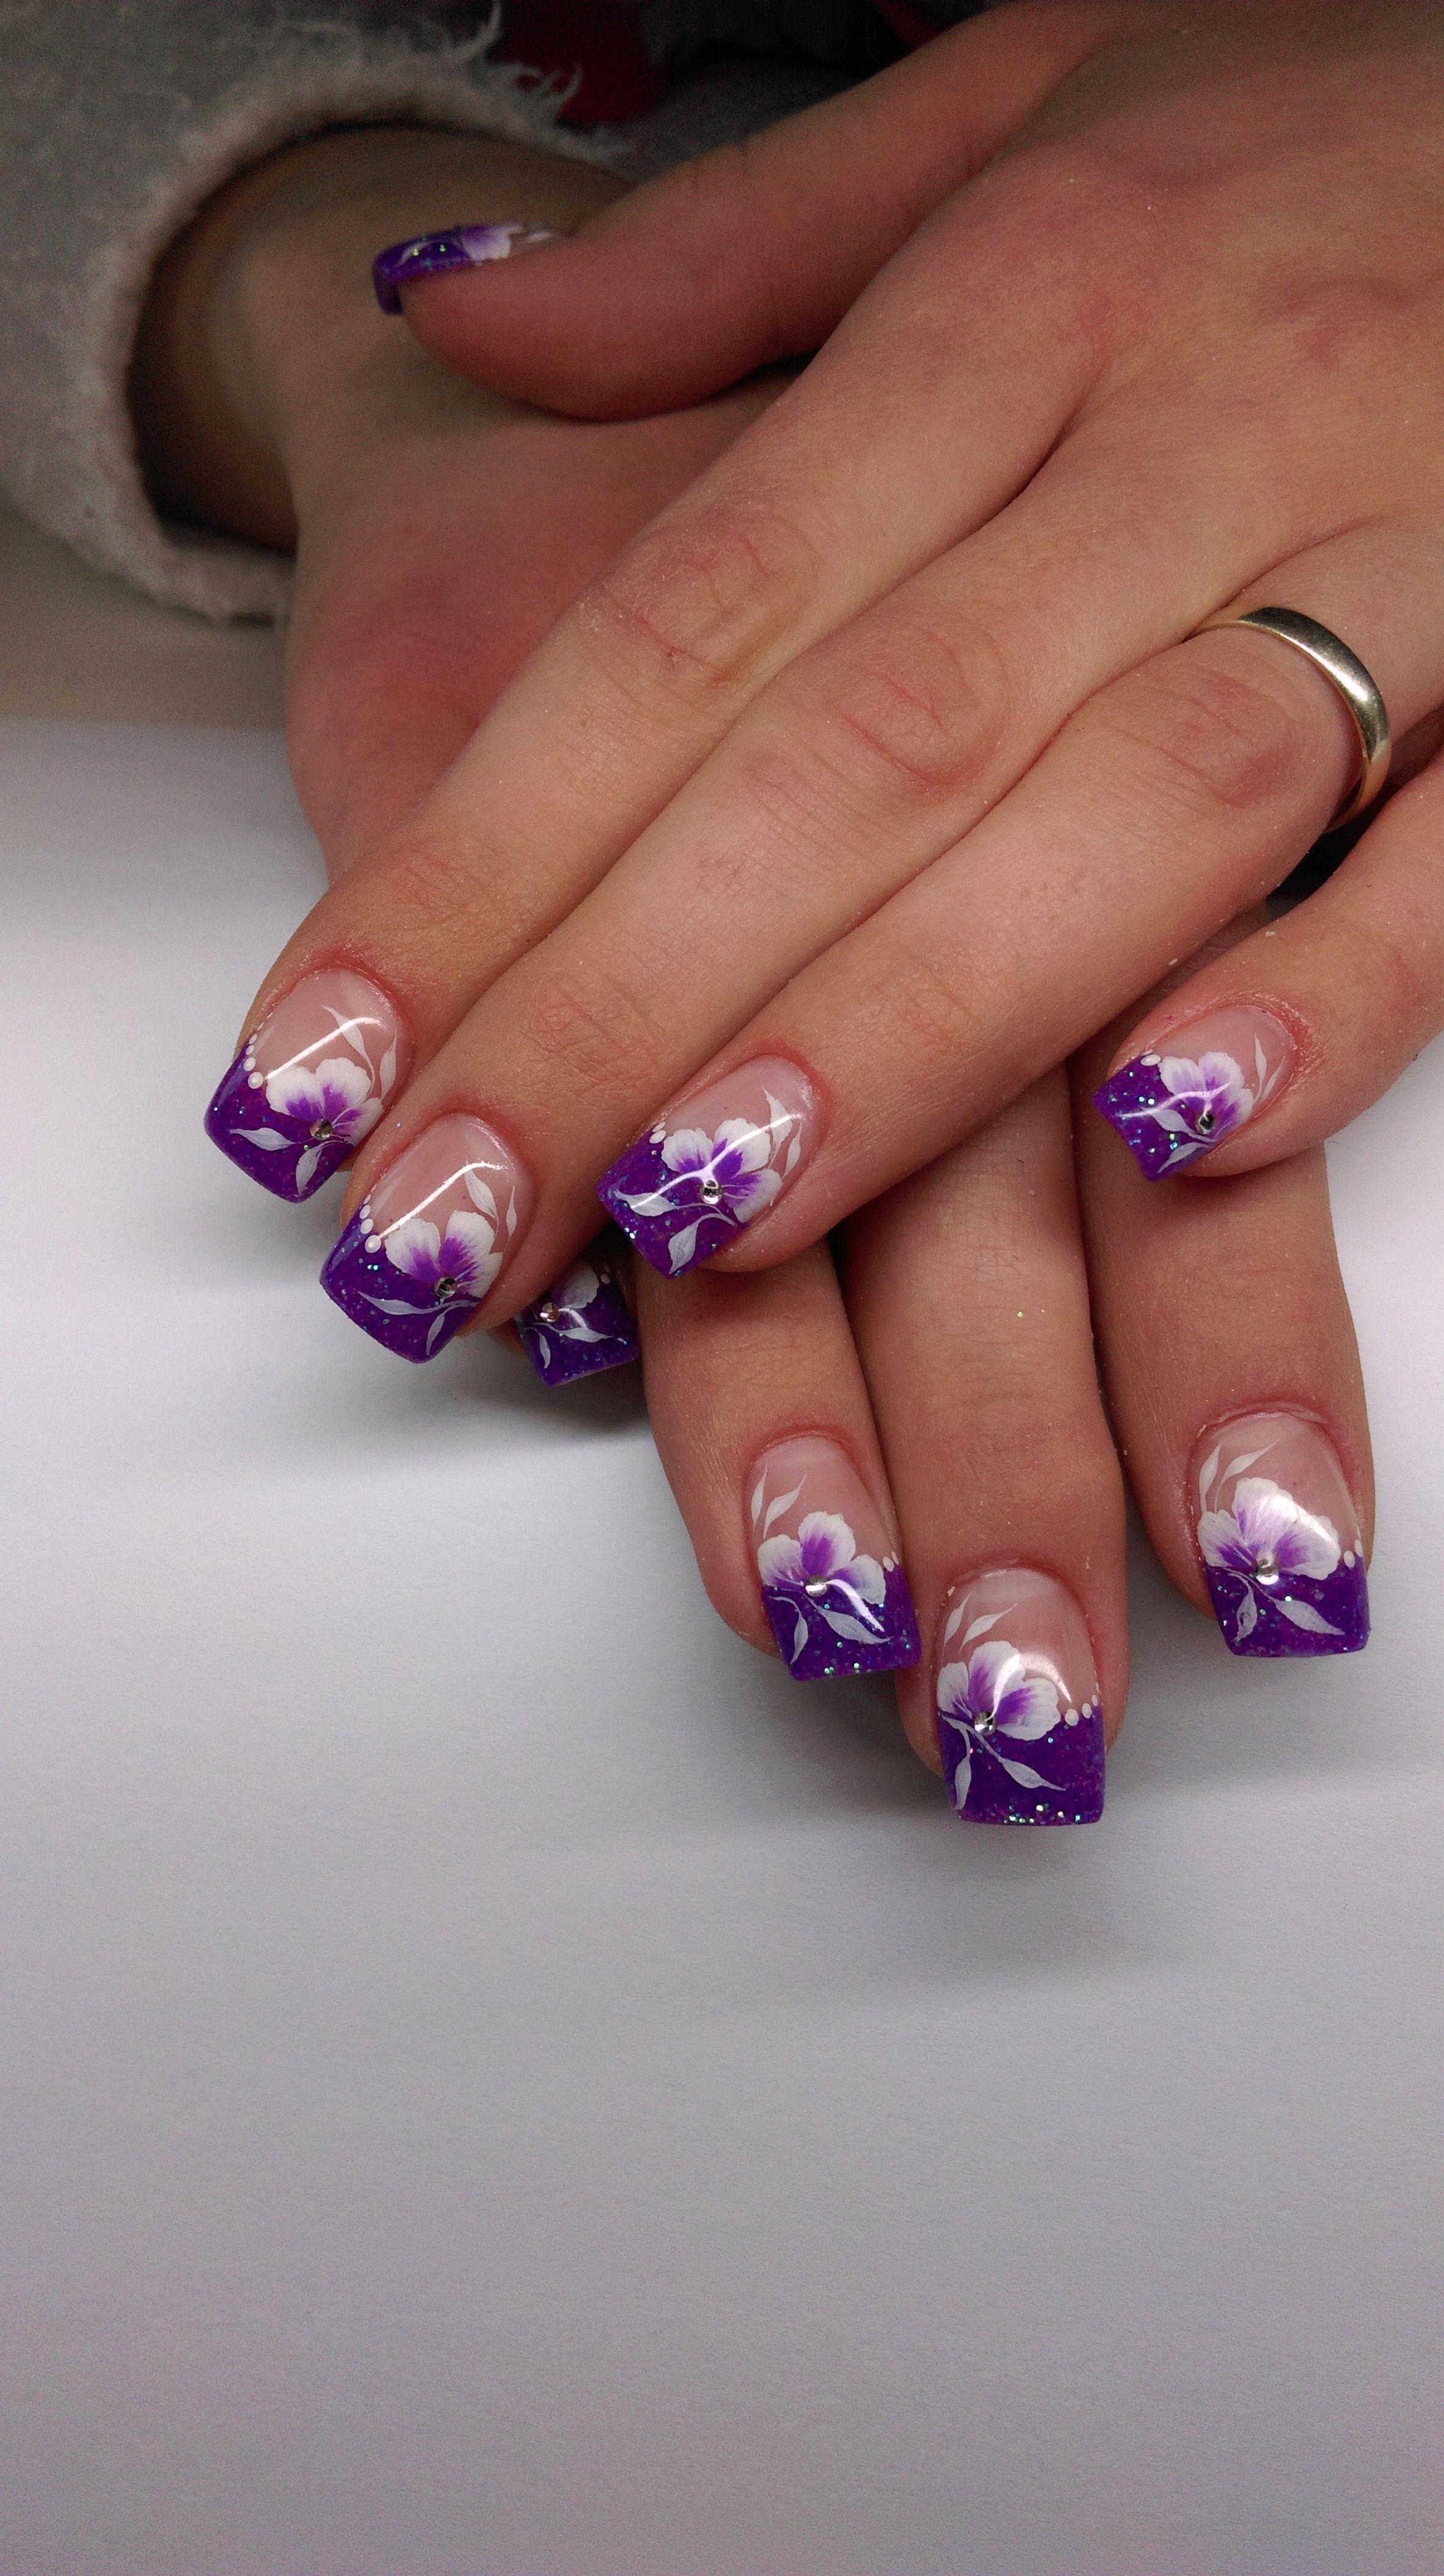 Pin By Judy Pyne On Nails Purple Nail Designs Purple Nail Art Designs French Nail Designs